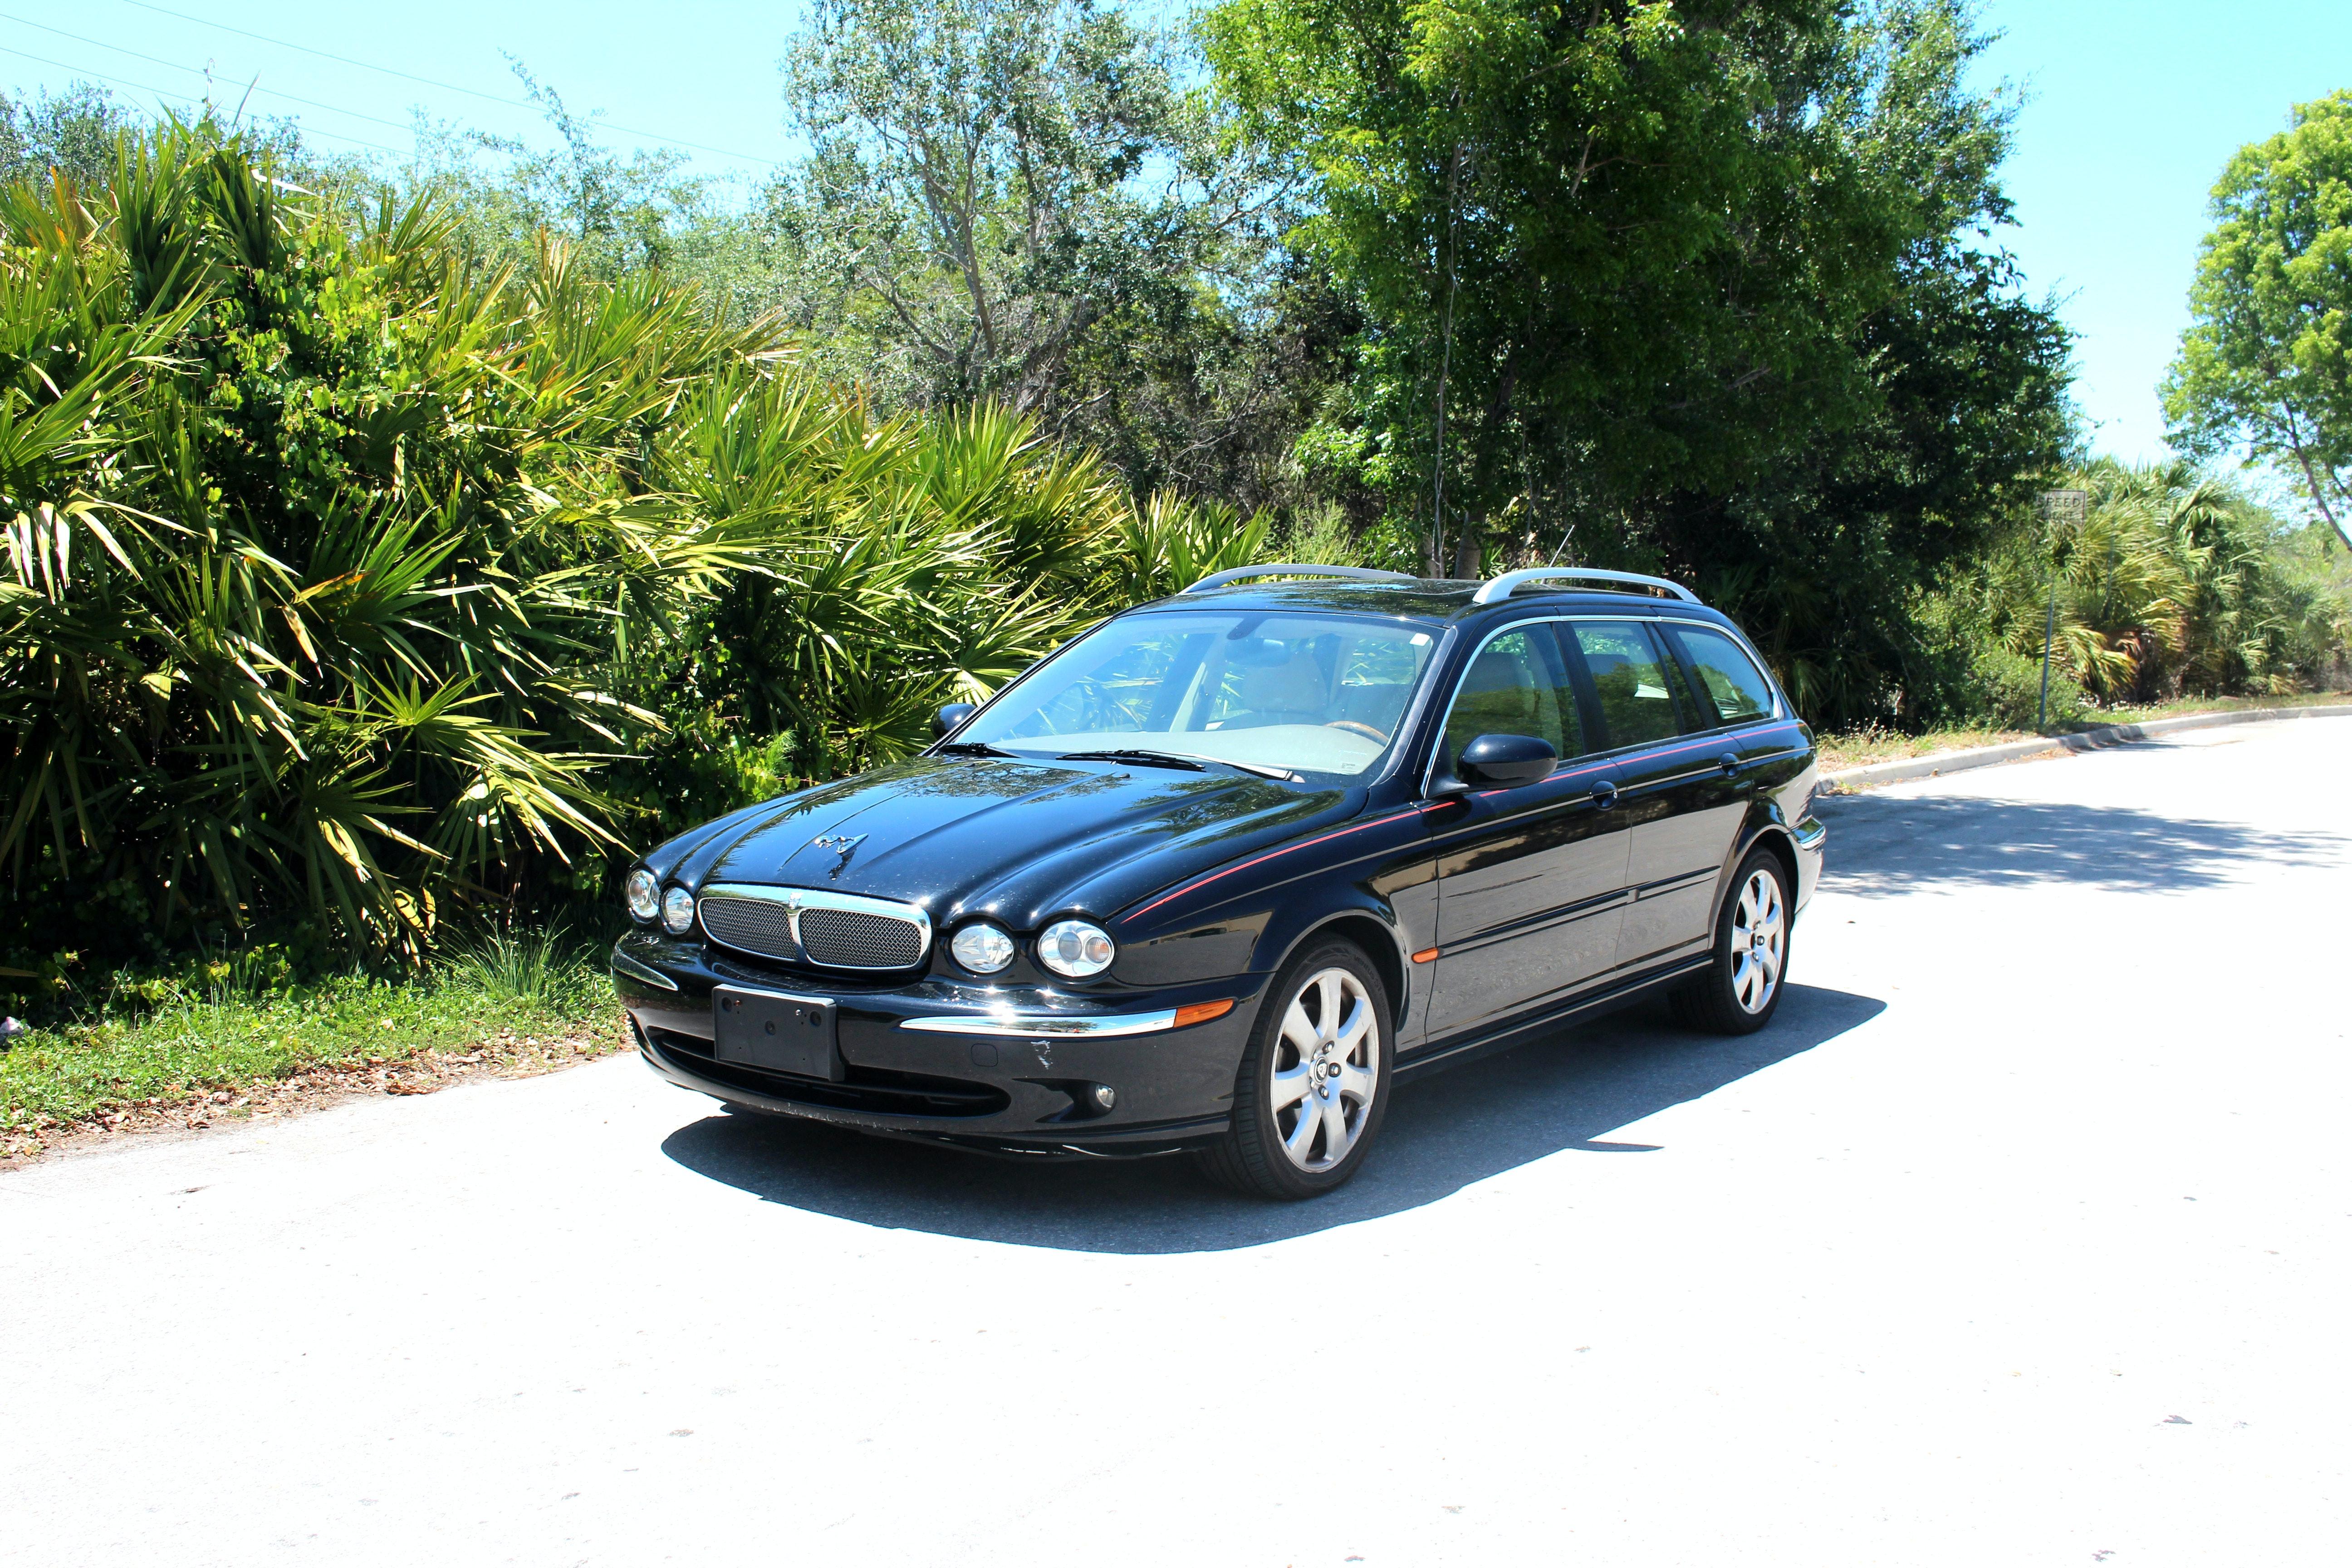 2006 Jaguar XType Station Wagon